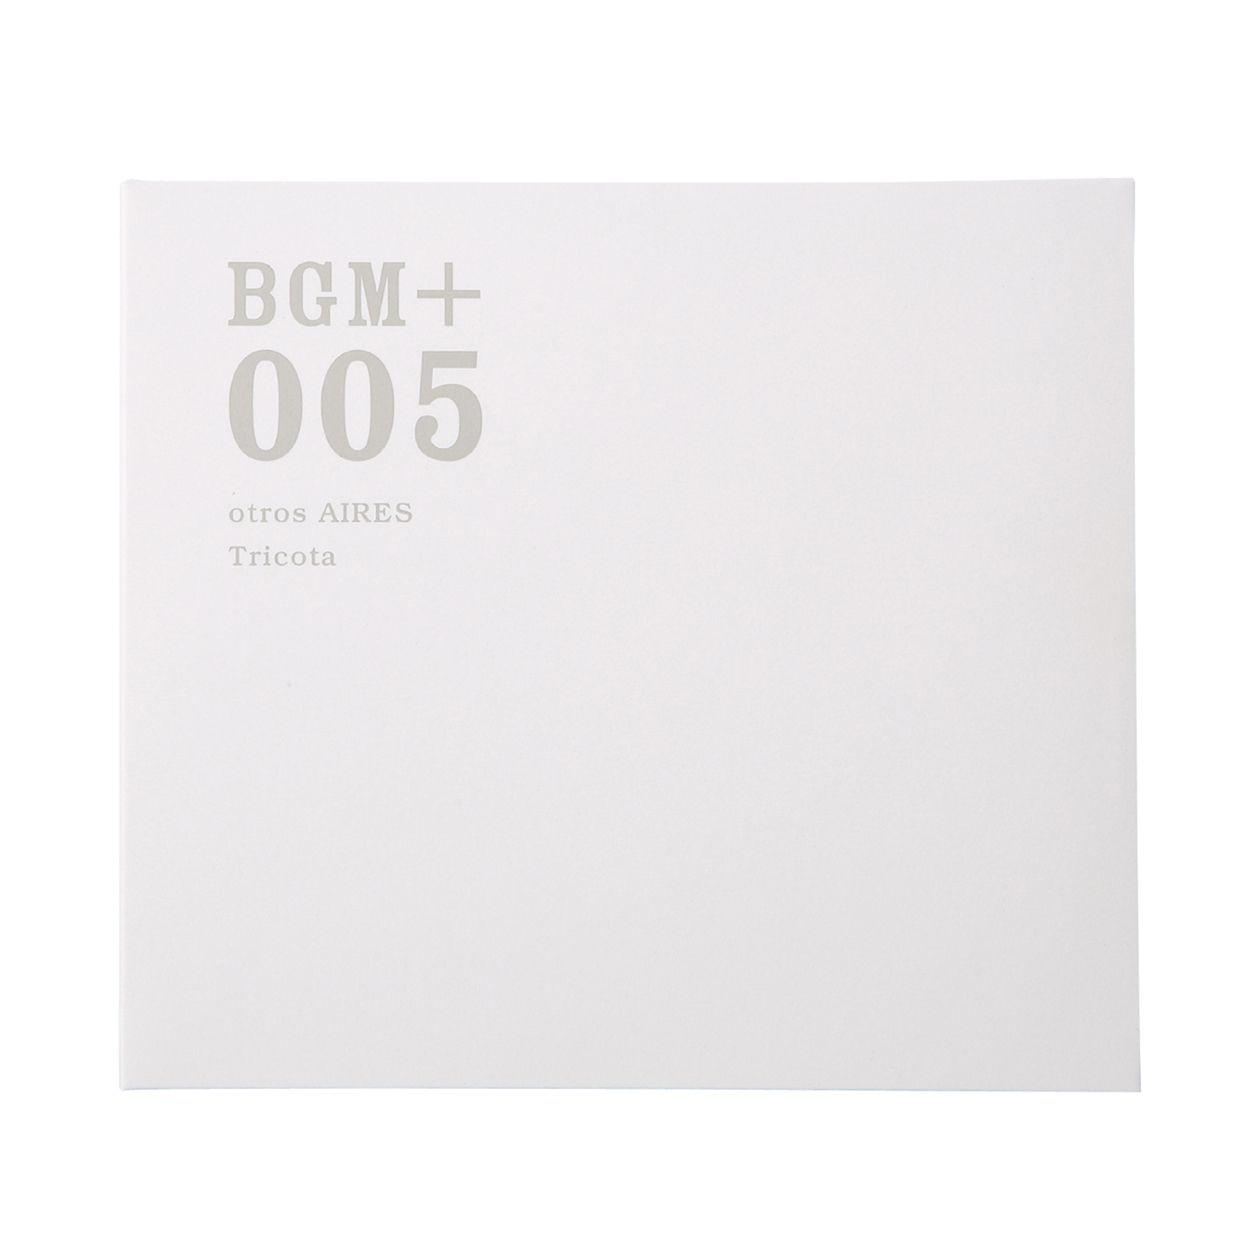 BGM+005